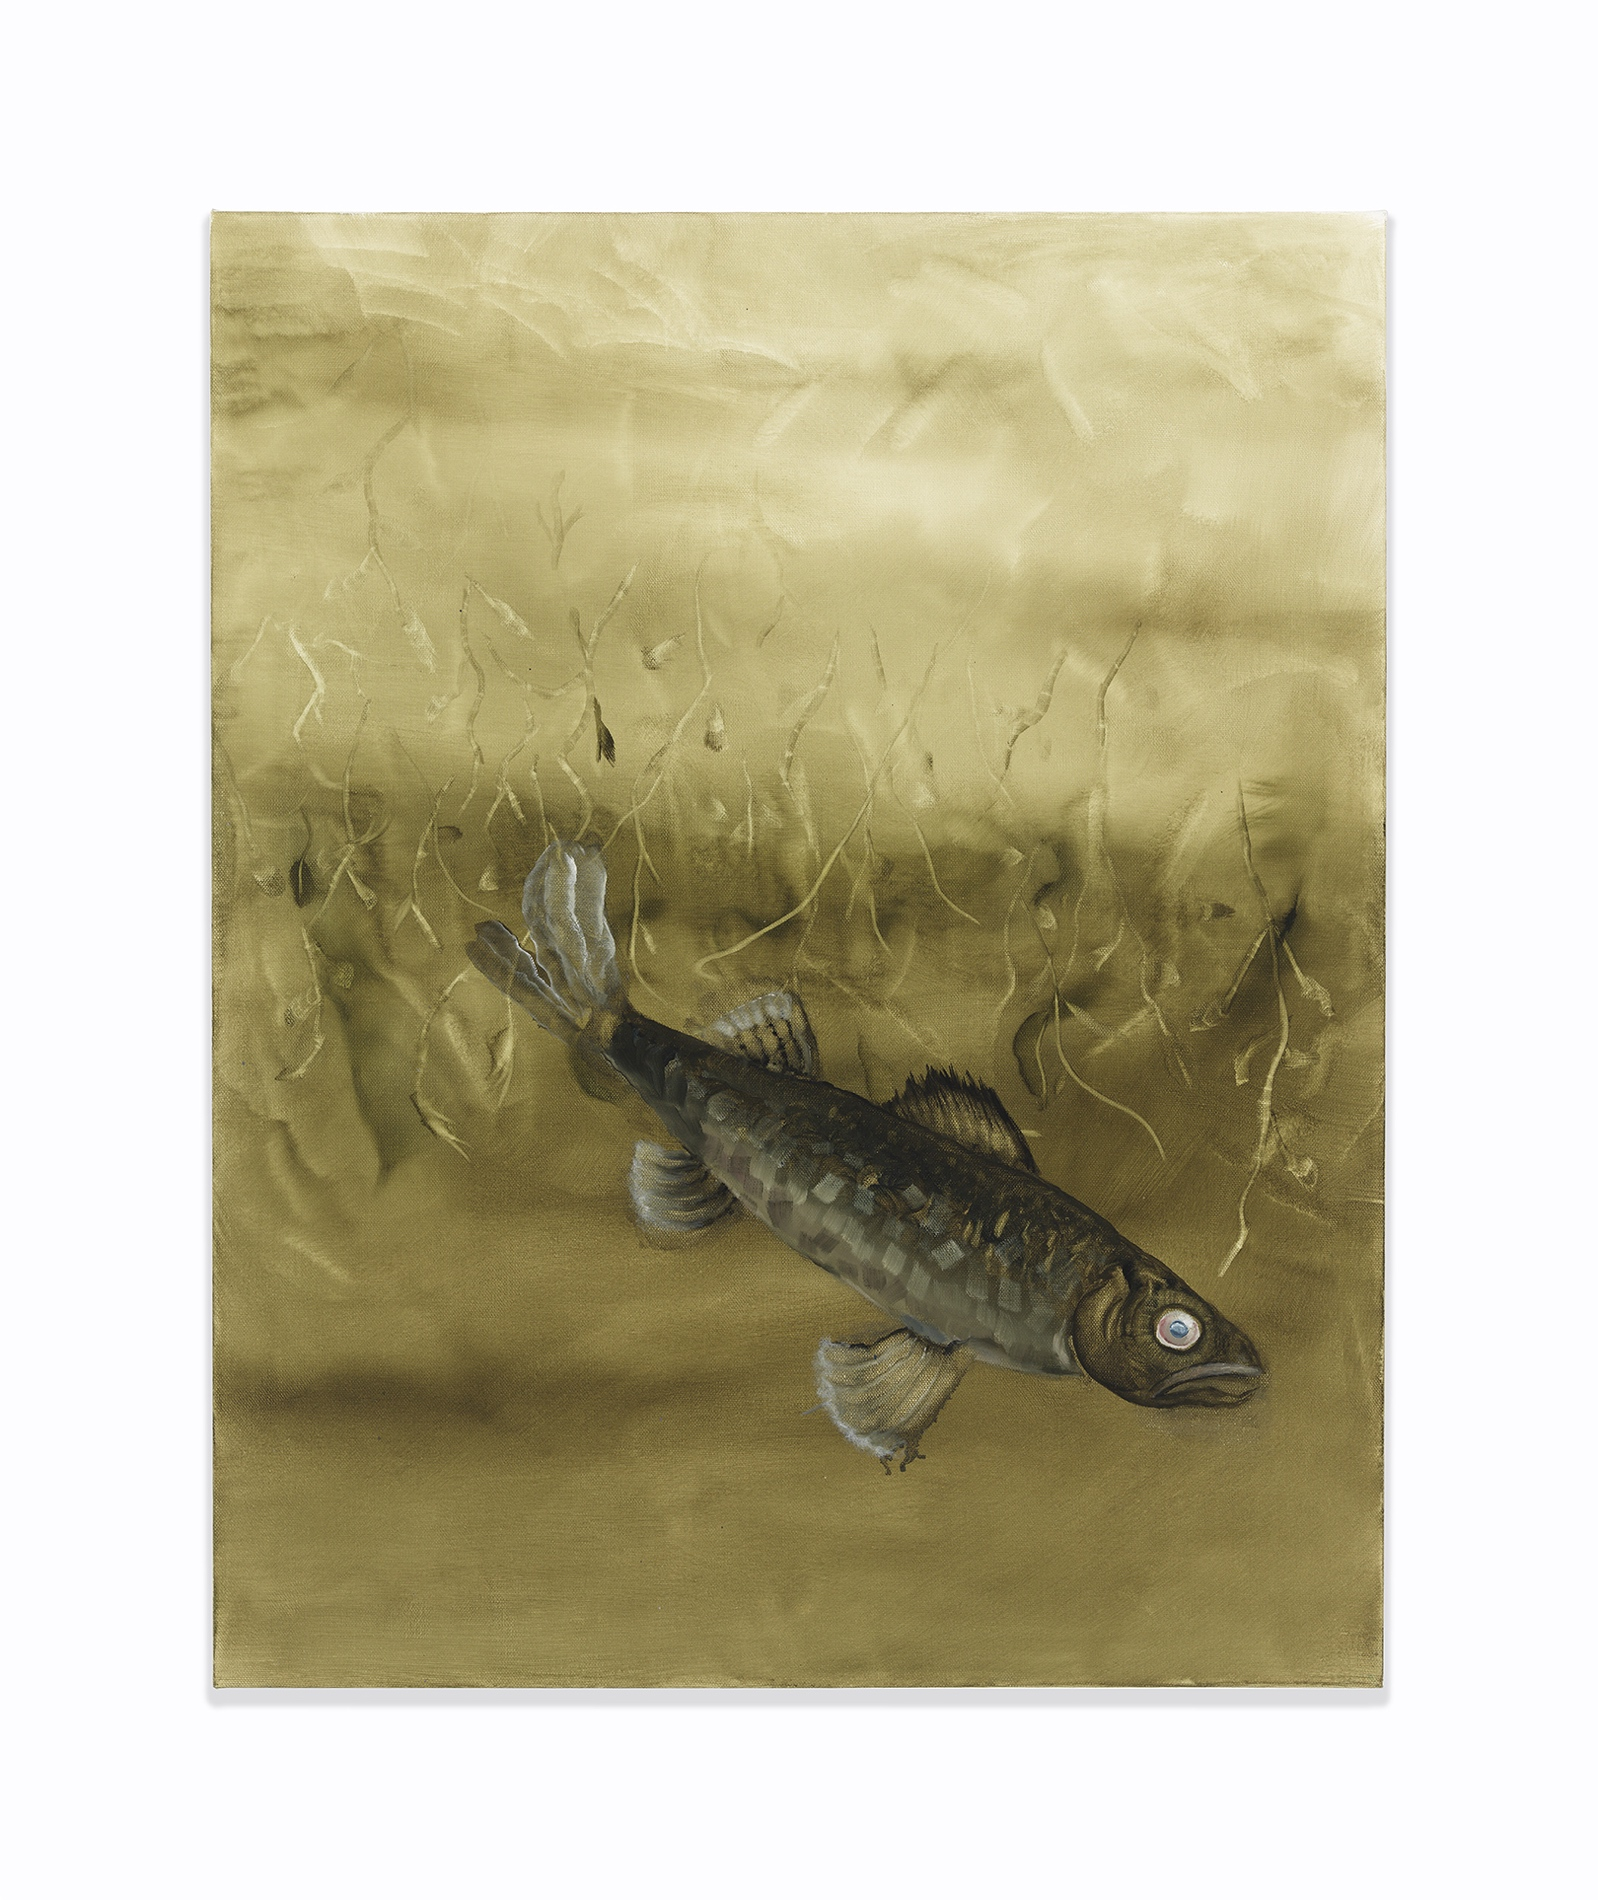 Autumn Ramsey,  Dead , 2016, oil on canvas, 30 x 24 inches (76.2 x 60.9 cm)